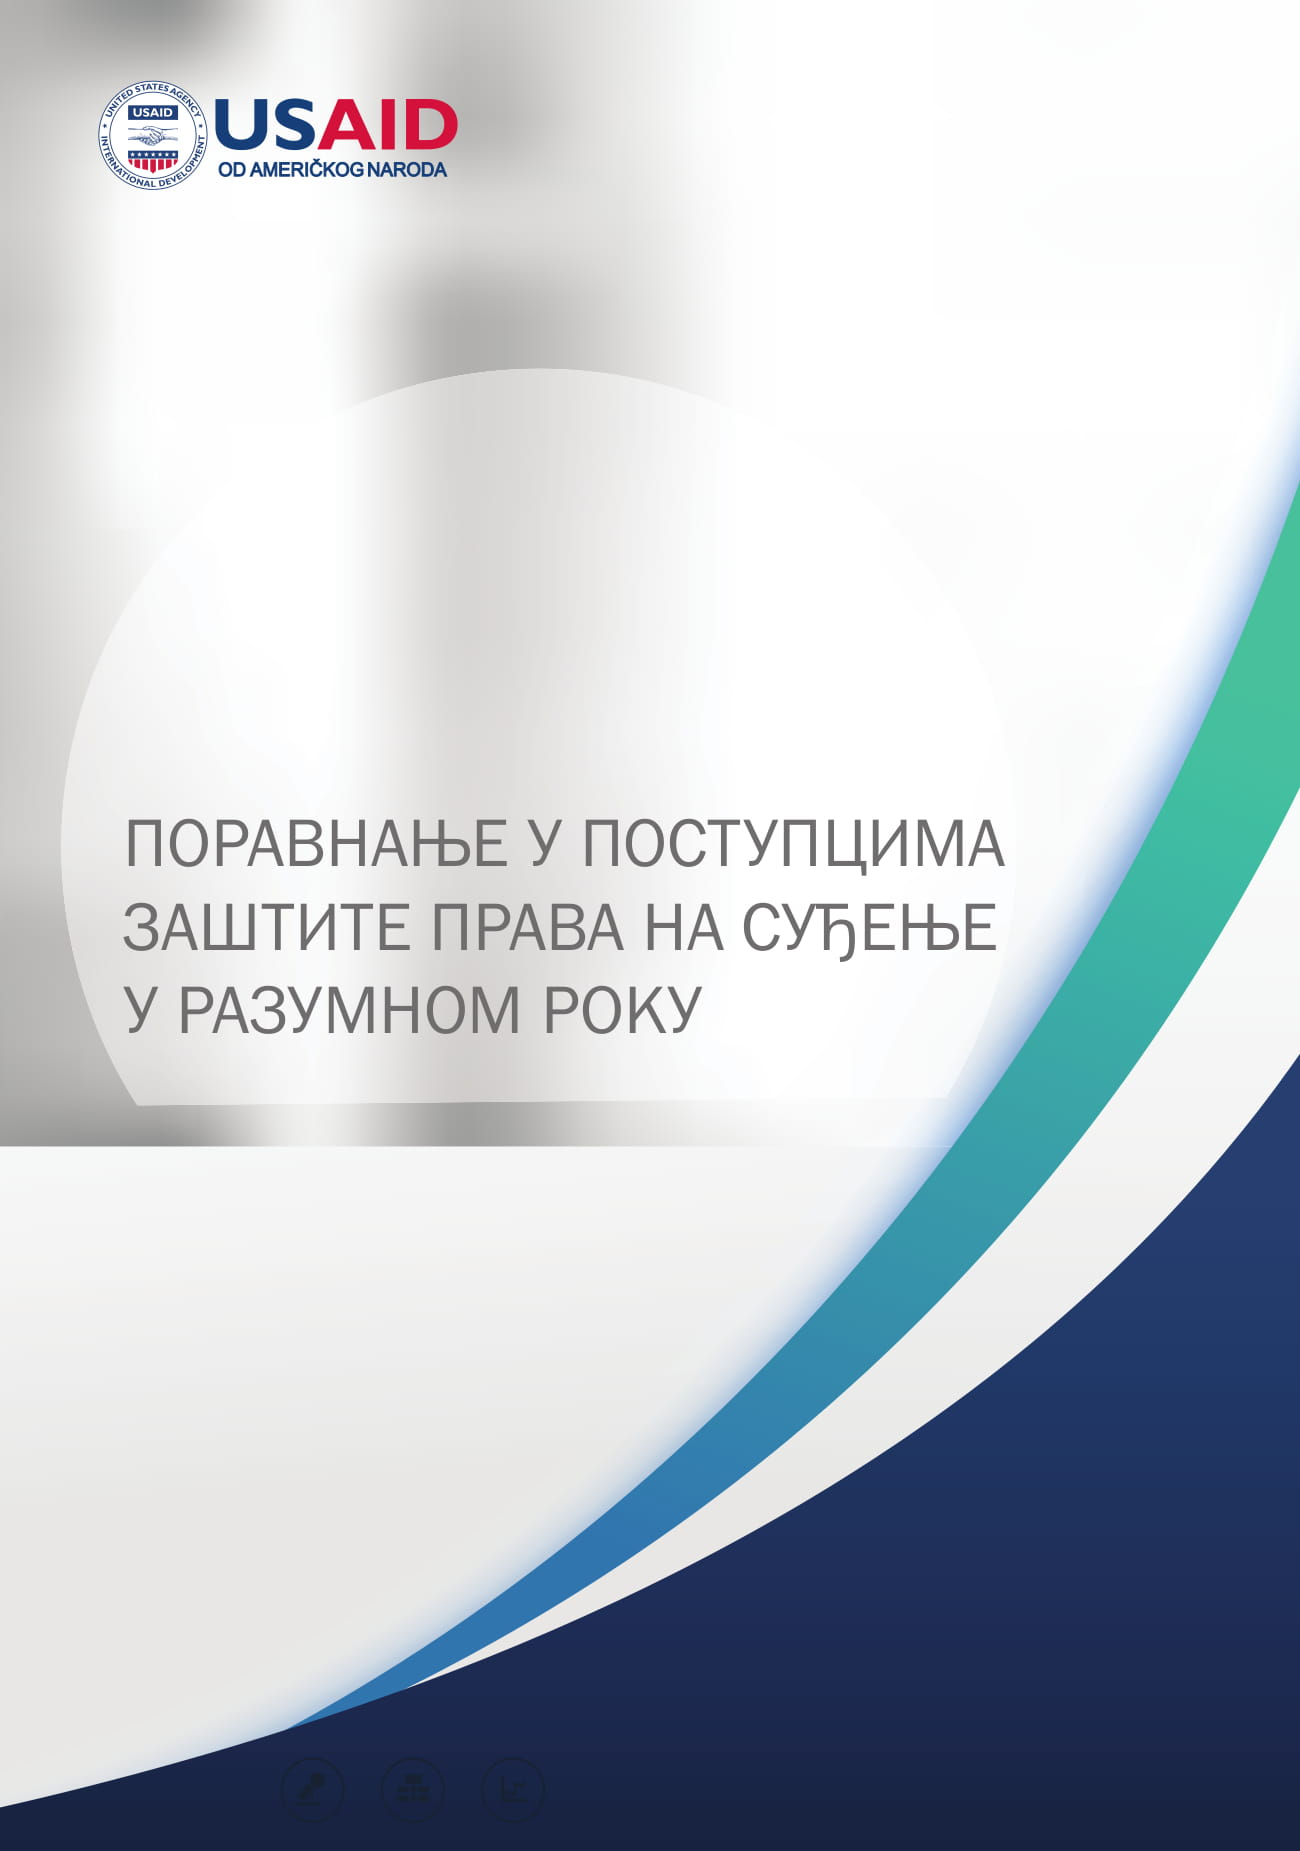 poravnanje-kod-povrede-prava-na-sudjenje-u-razumnom-roku-brosuraremoved-1.jpg